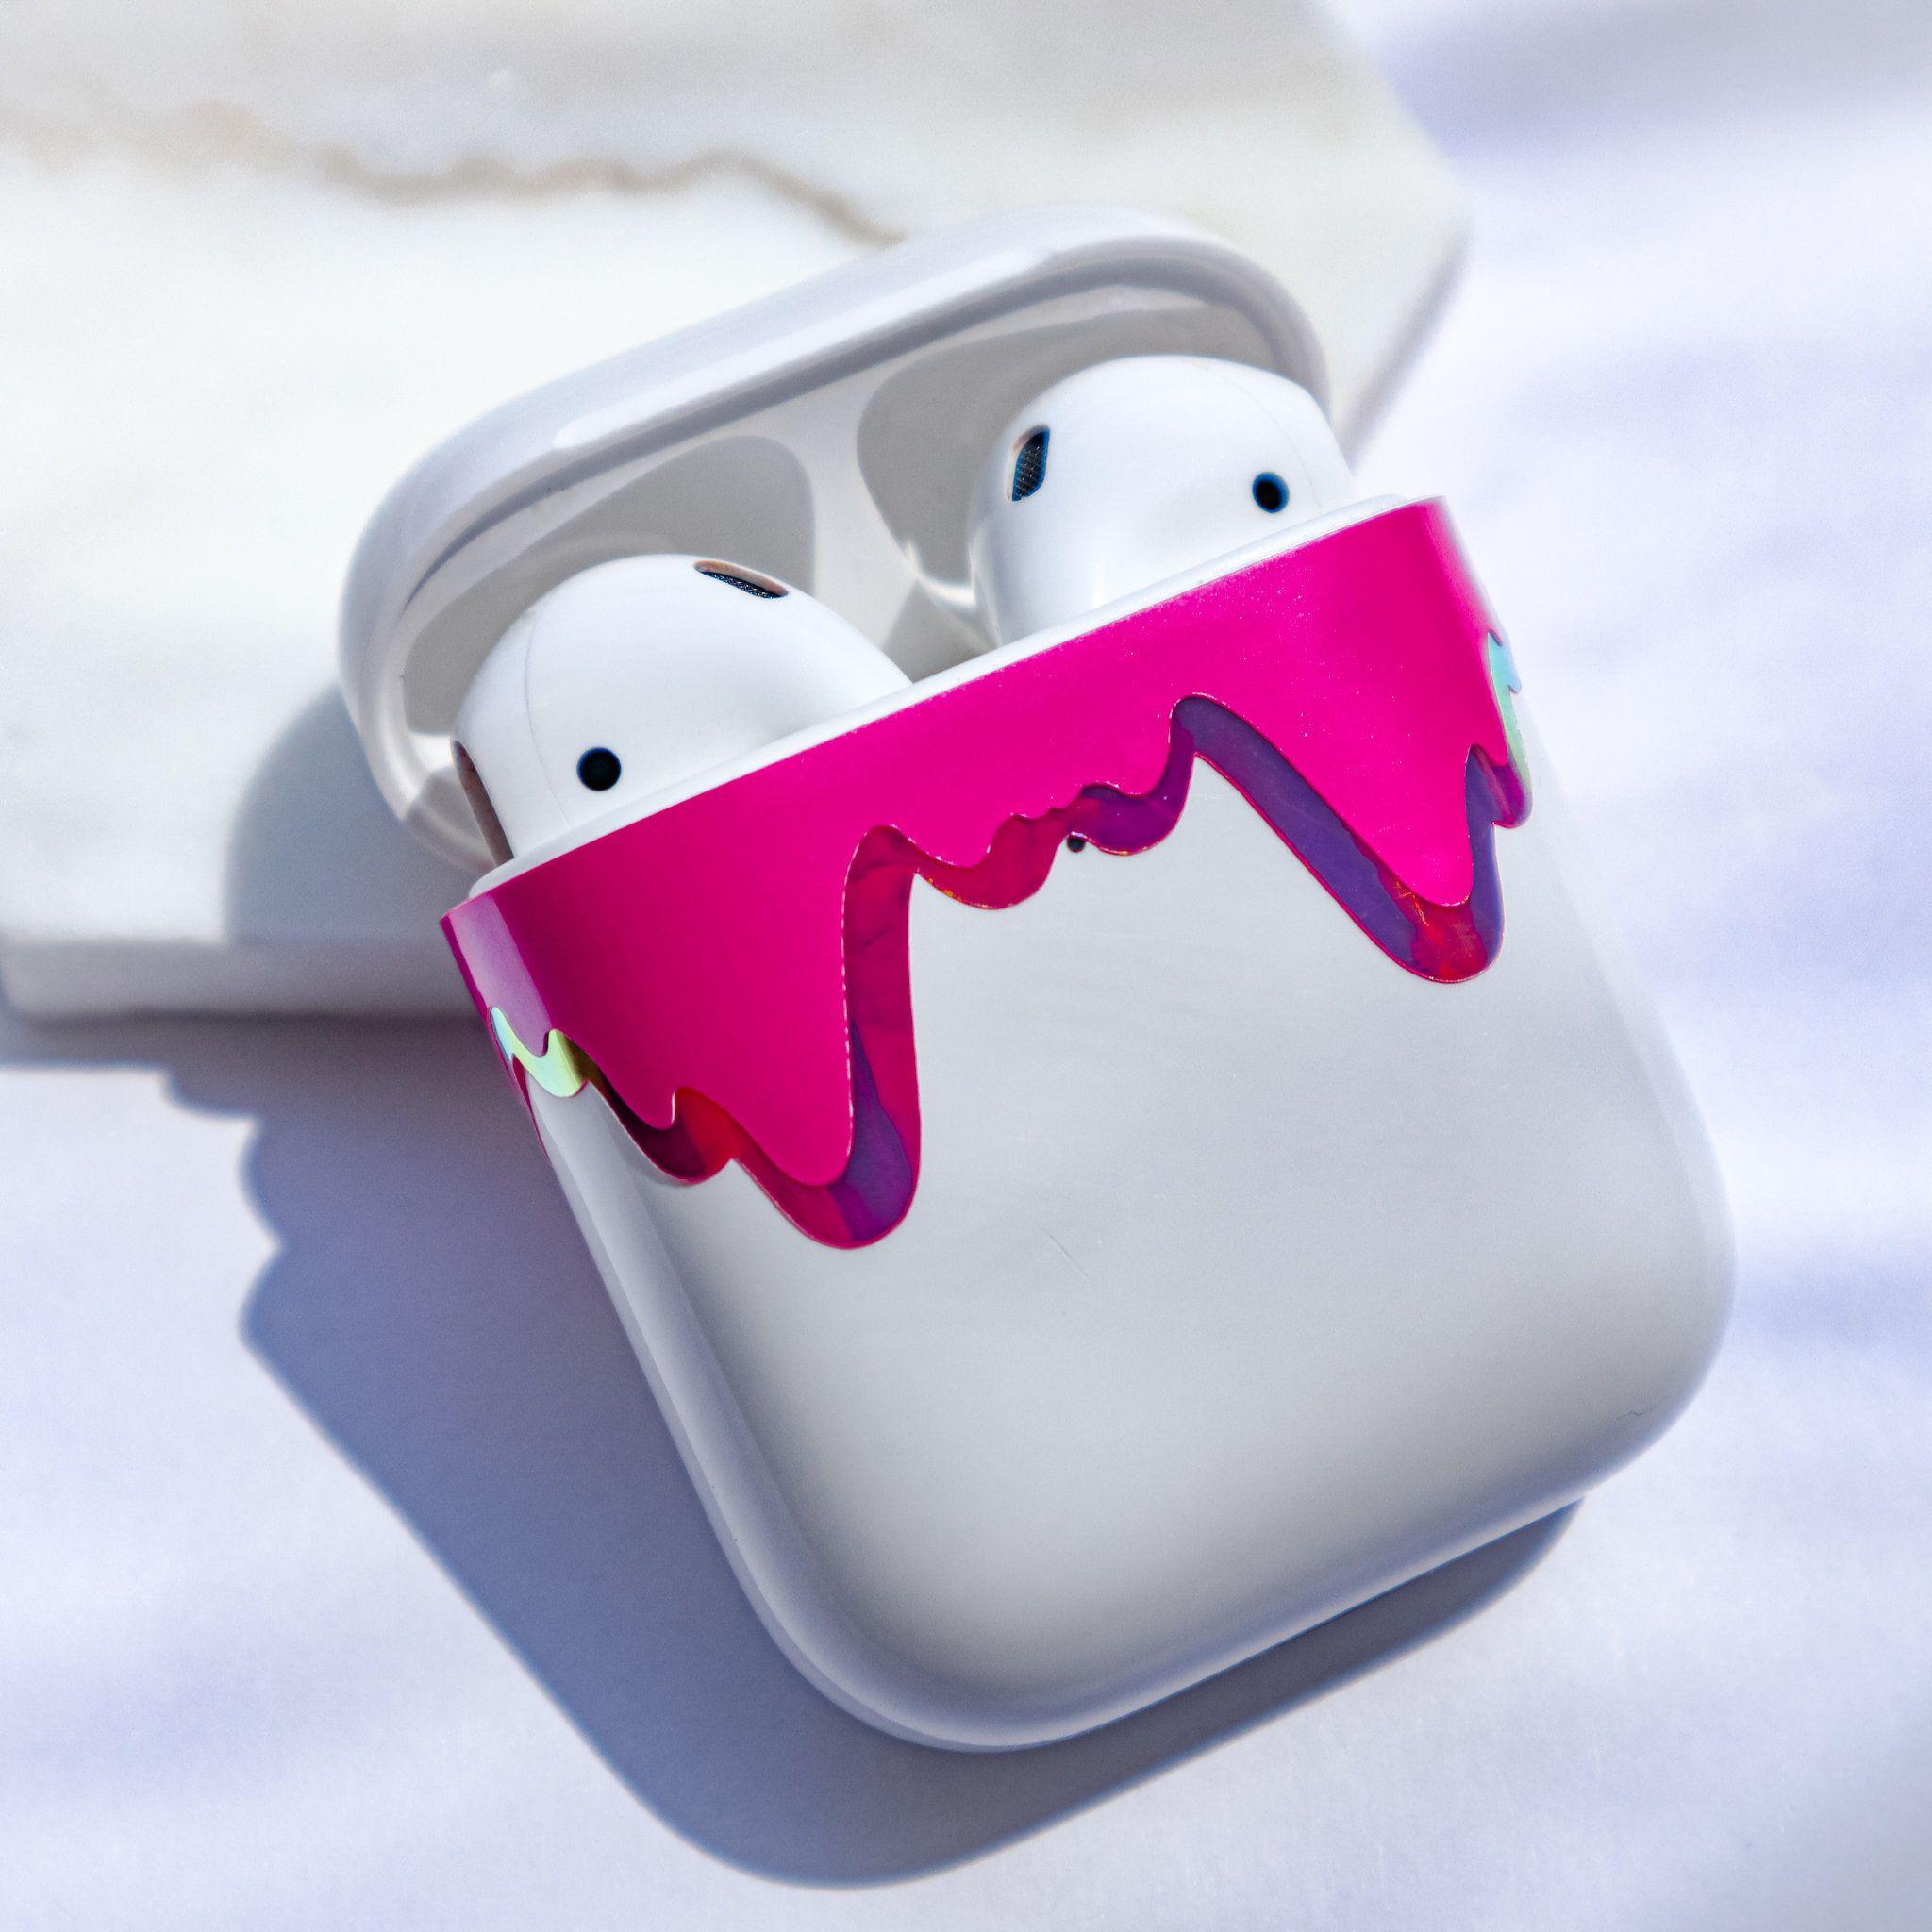 Airpod Case Decal Airpod Pro Drippy Holographic Apple Etsy Airpod Case Case Holographic